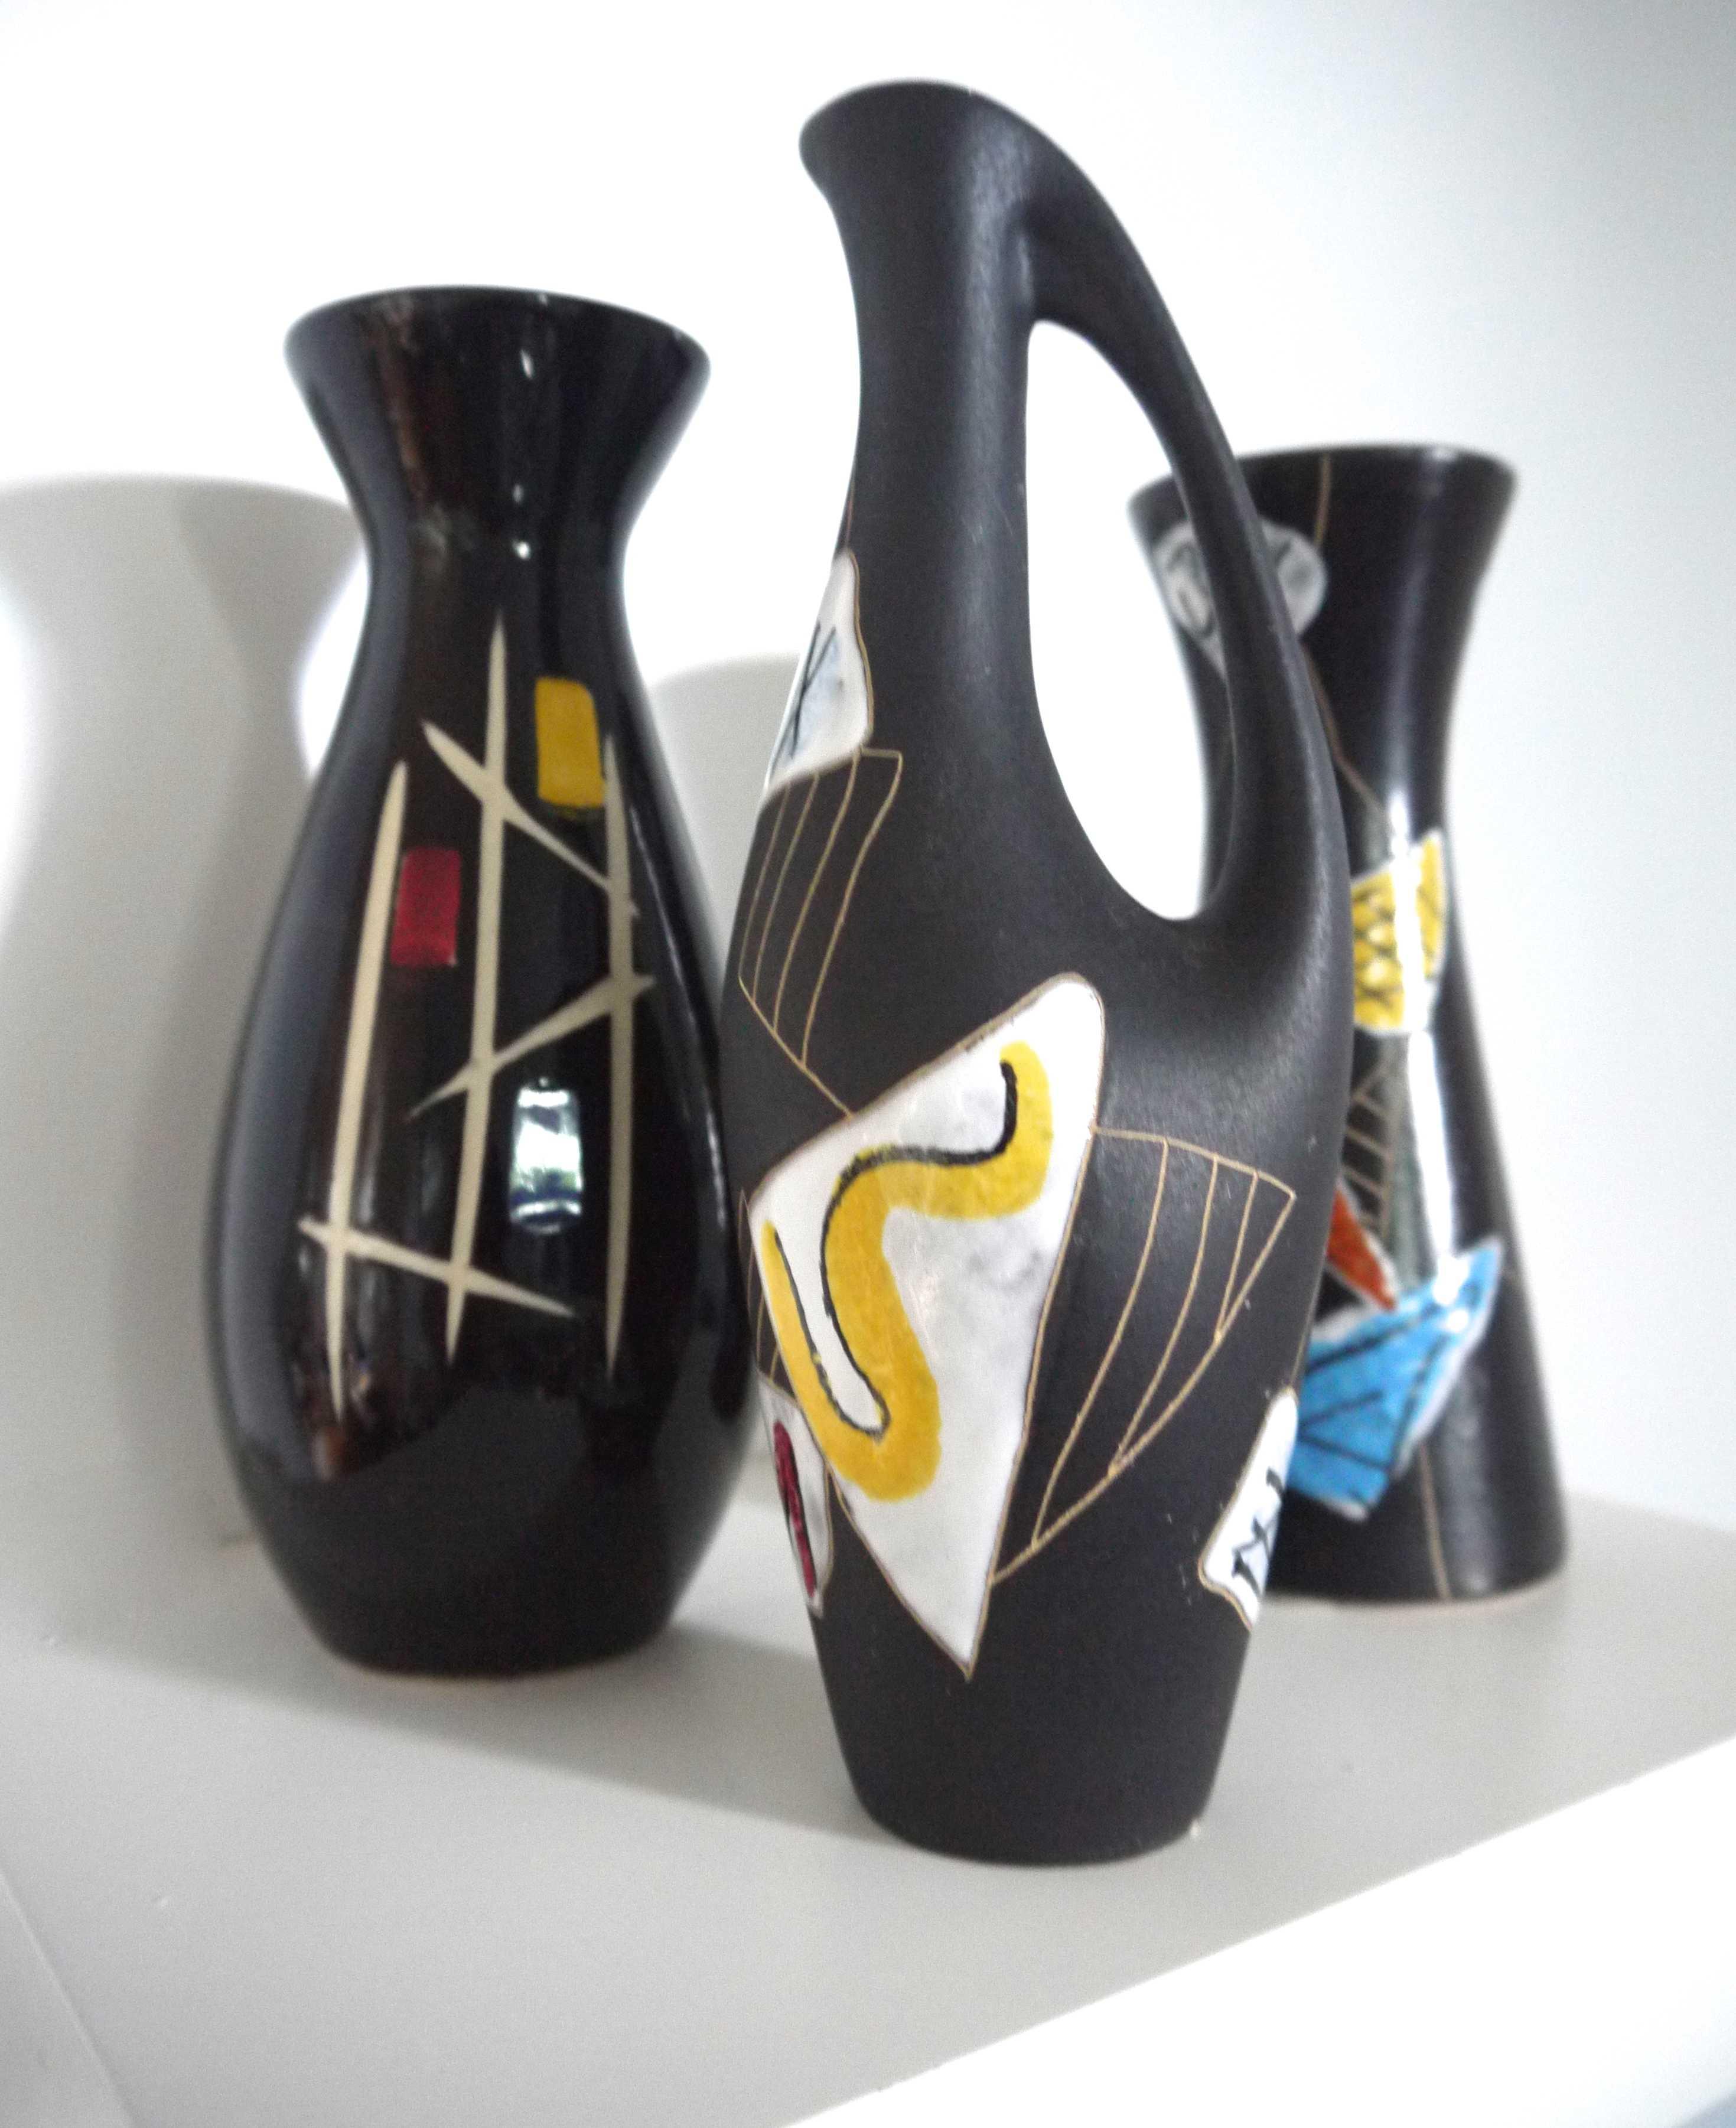 Of ruscha vases inc rare ruscha morocco vases trio of ruscha vases inc rare ruscha morocco vases signed reviewsmspy